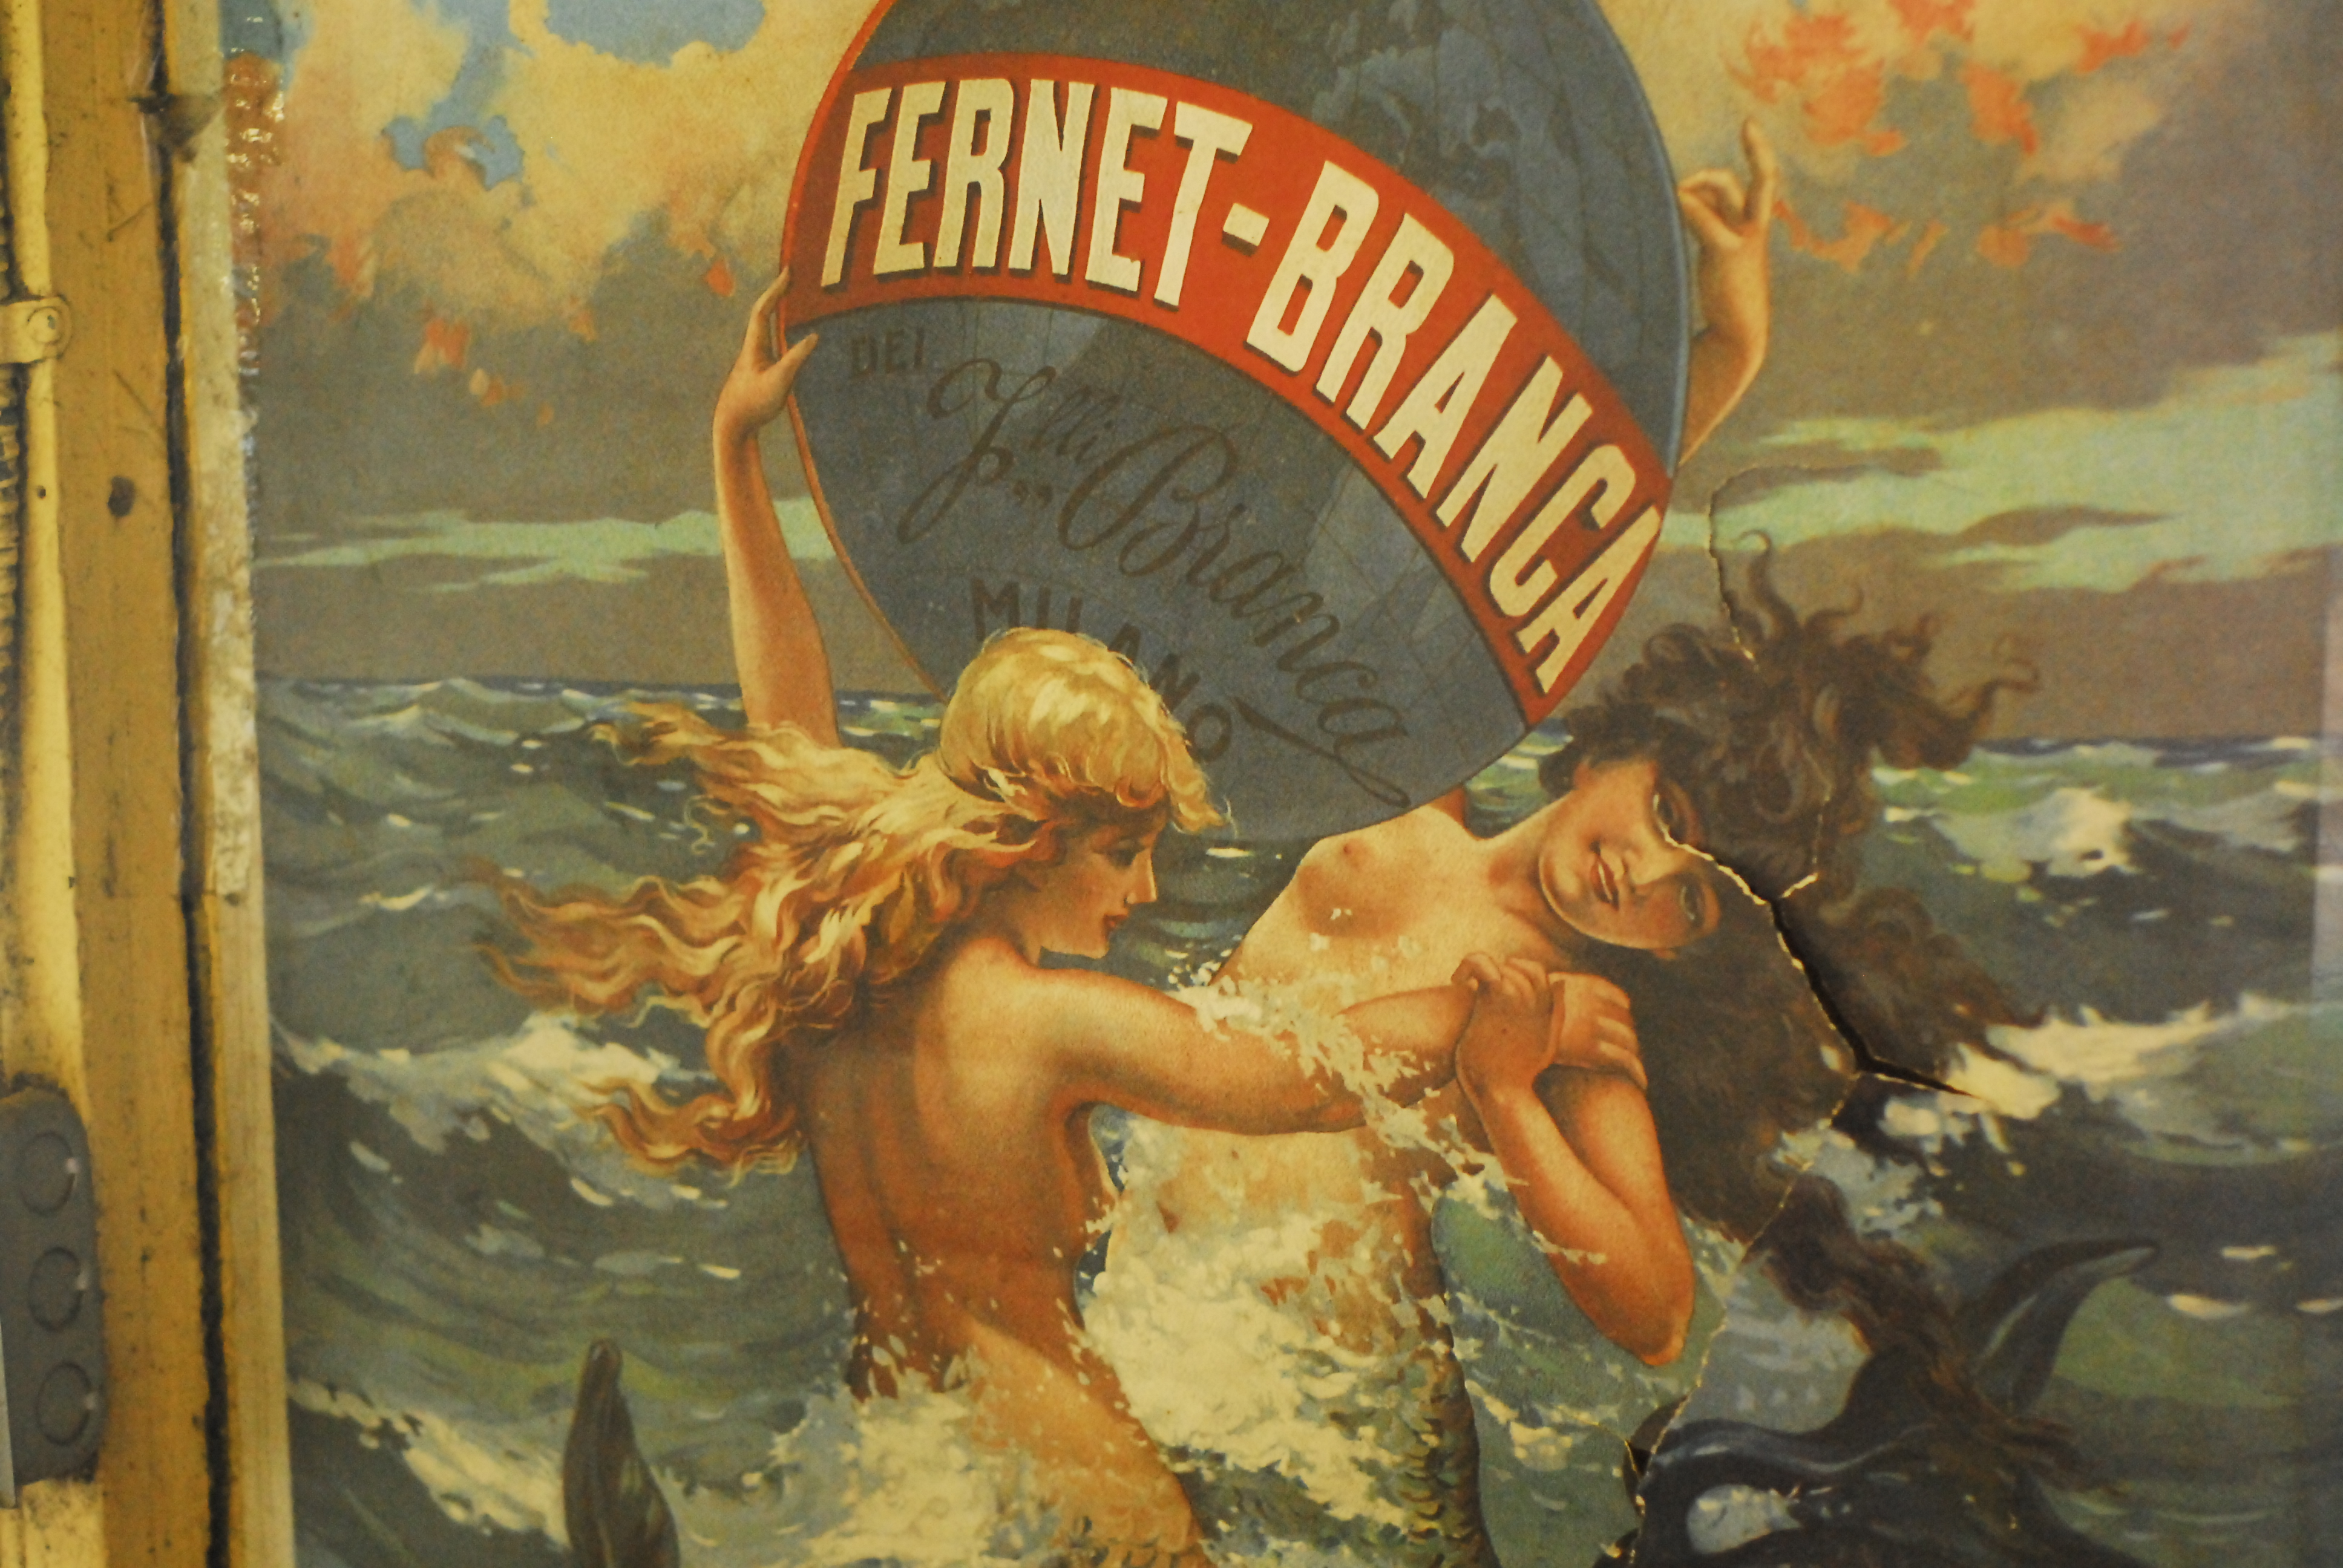 Fernet Br